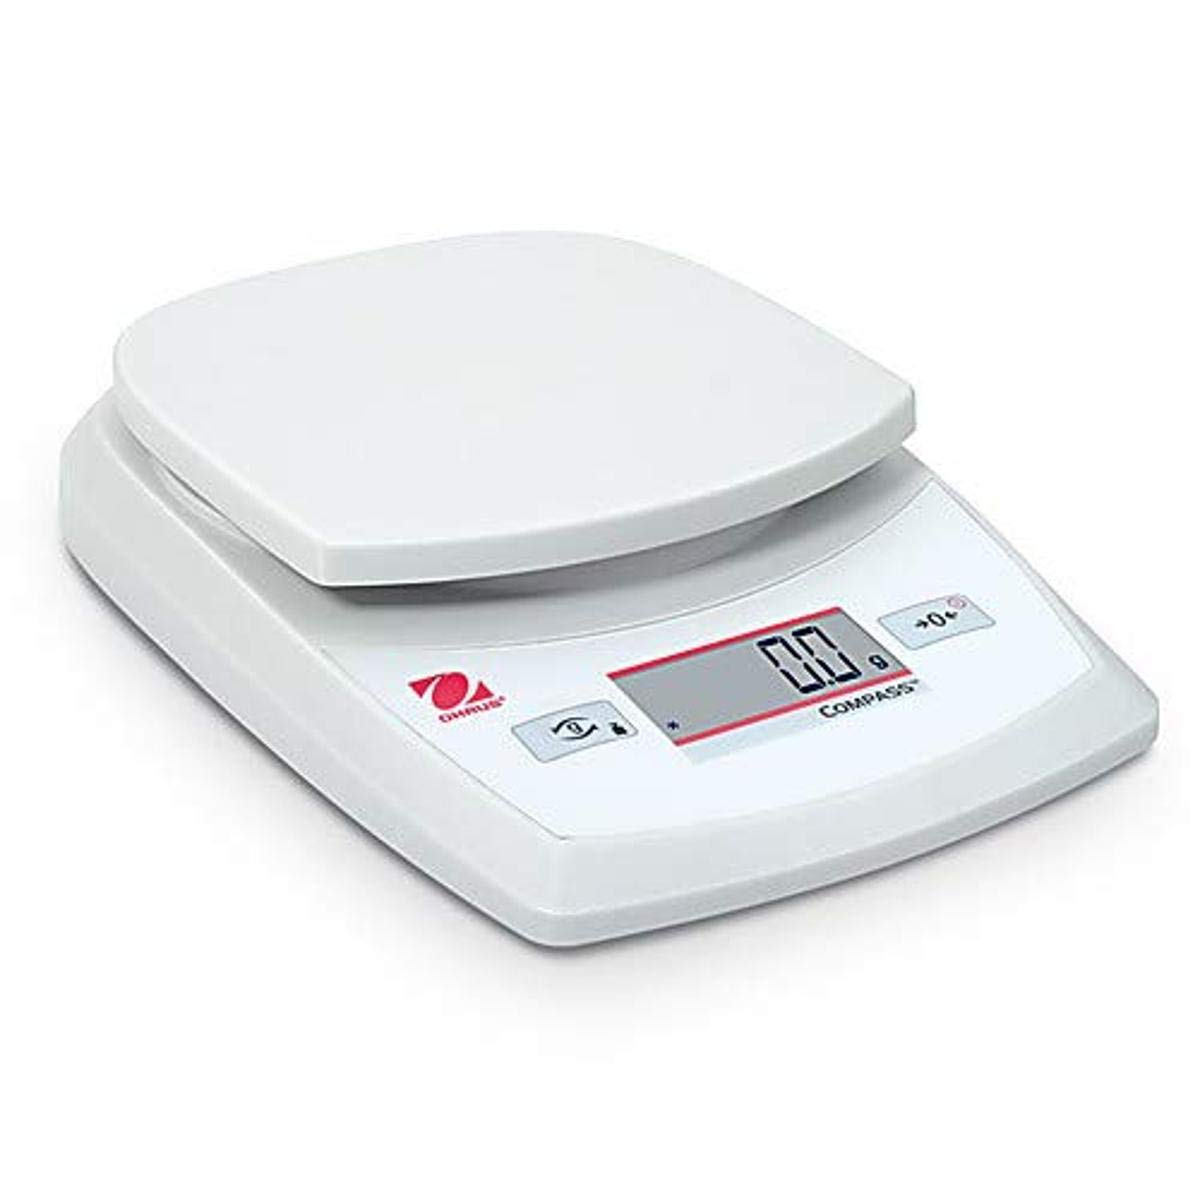 Ohaus 30428204 Compass CR221 Portable Scale 0.1g Readability 220g Capacity